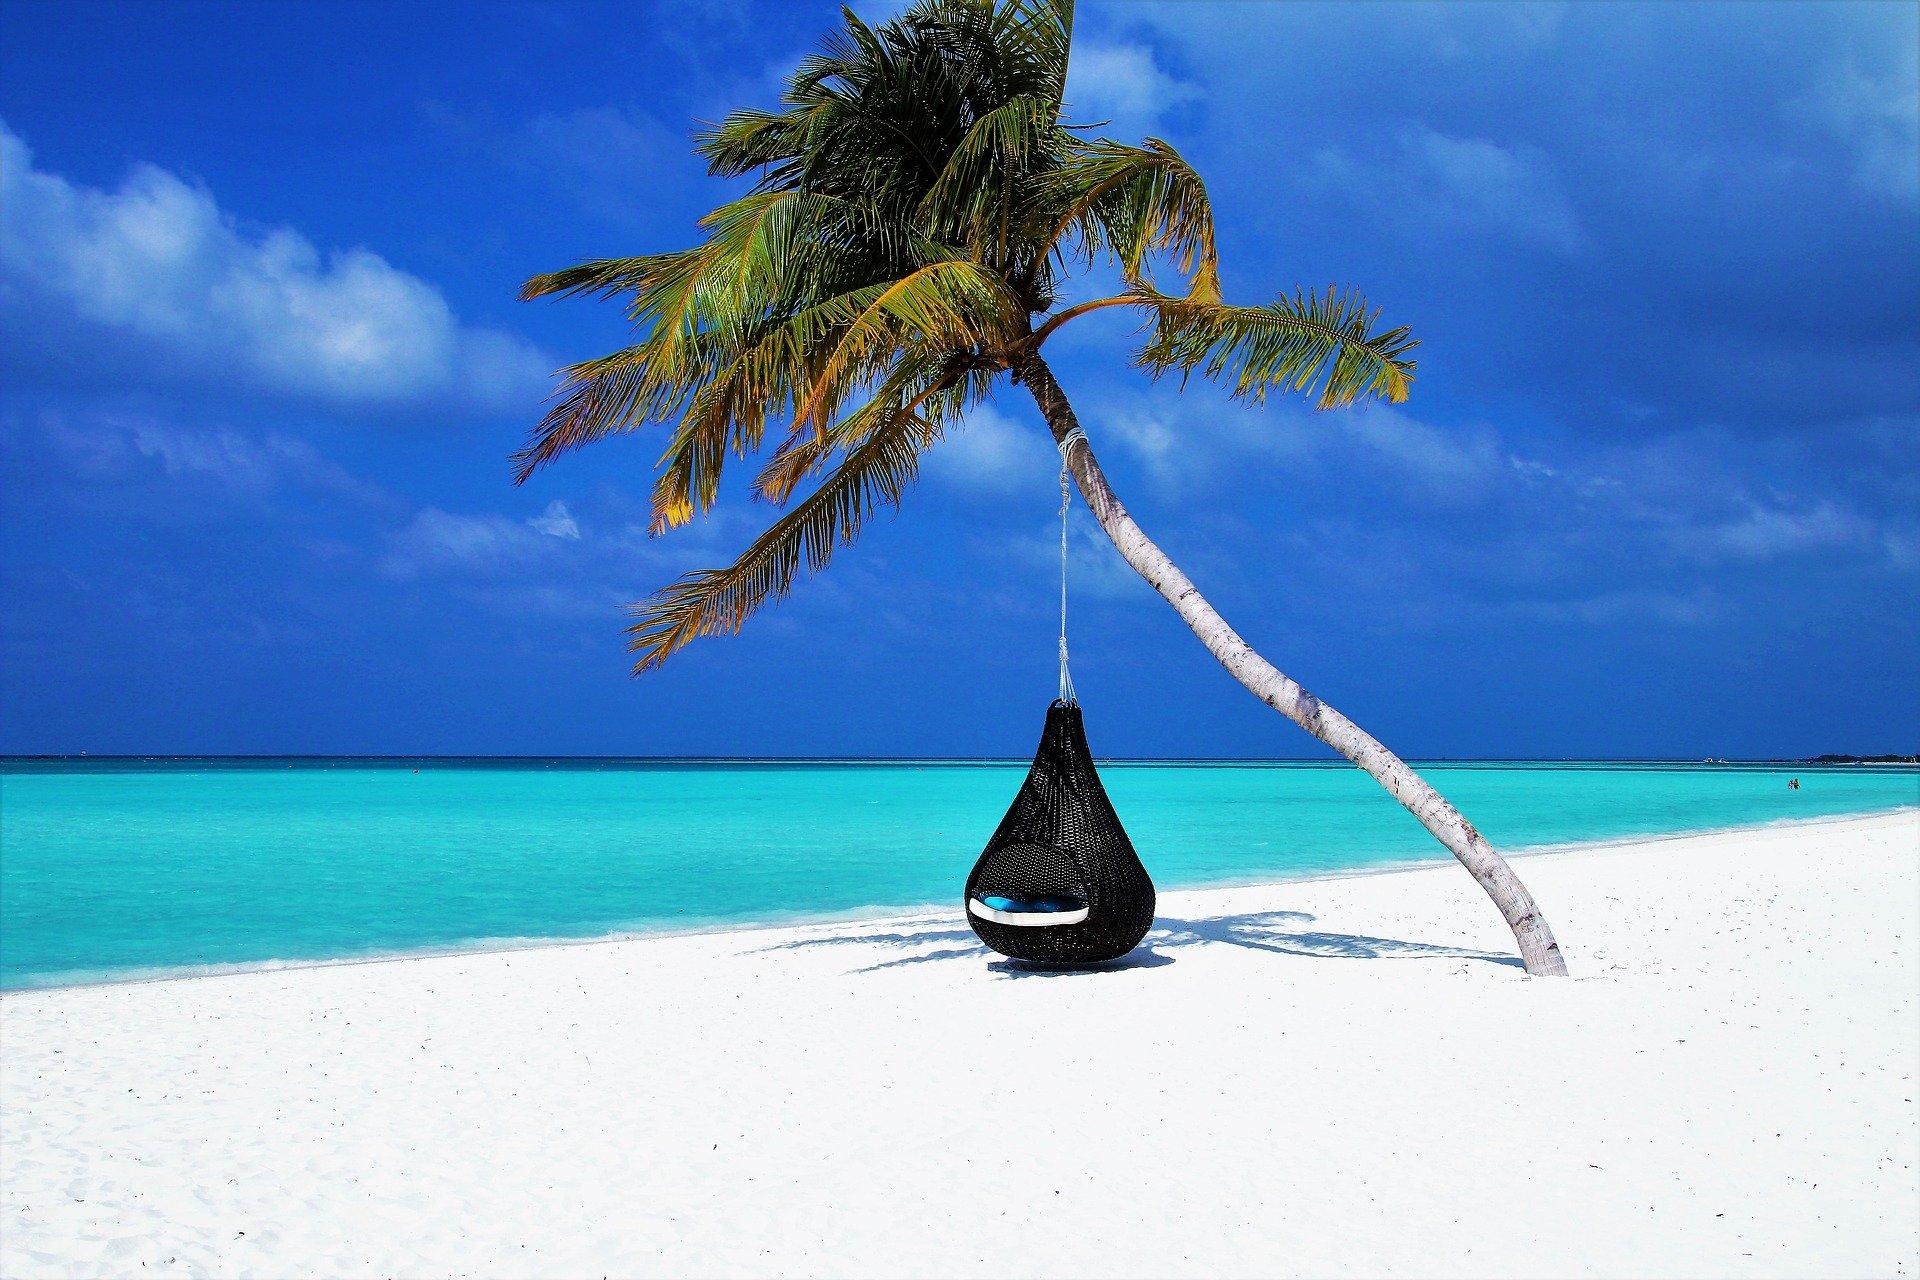 maldives-3220702_1920 (1)